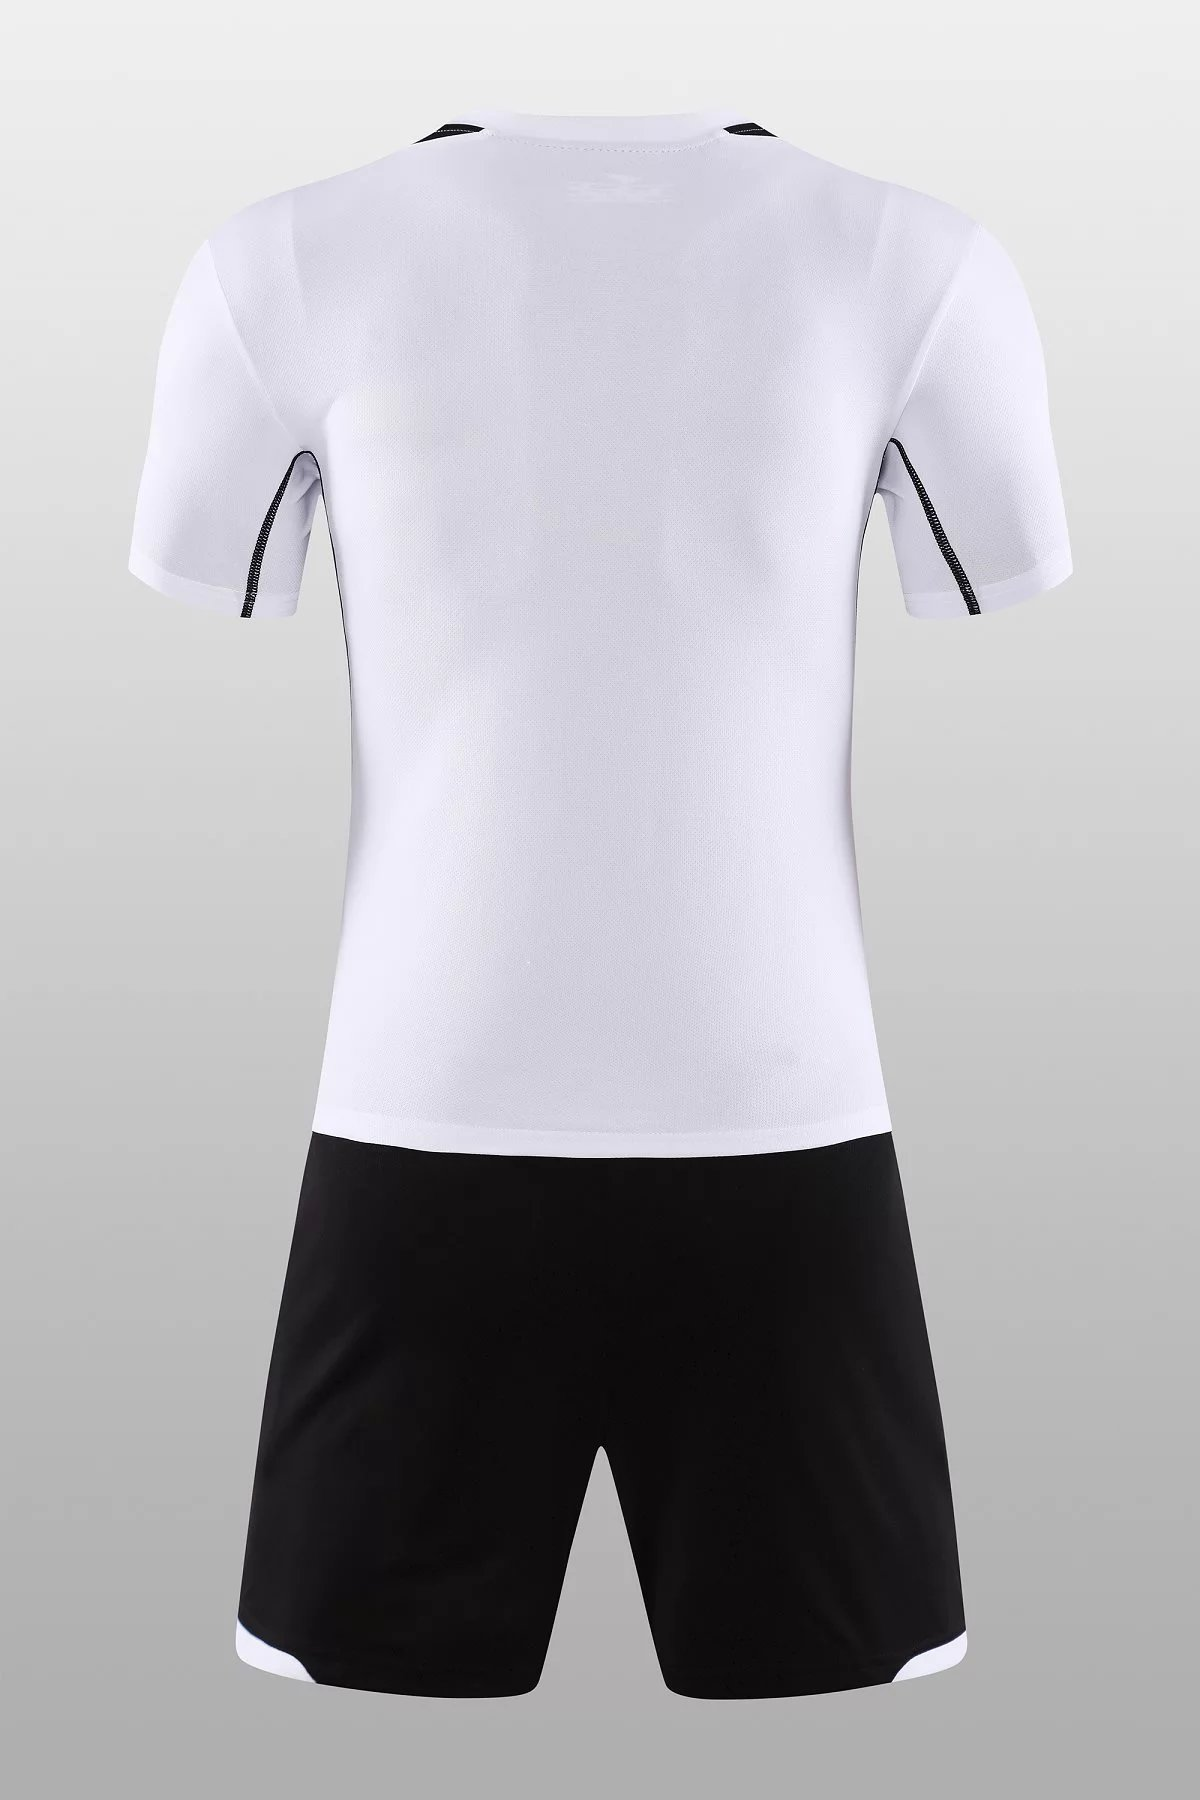 Custom Men Women Training Survetement Football Jerseys 2017 Customize Tracksuit Soccer Uniform Jerseys Set Soccer Jerseys Kits